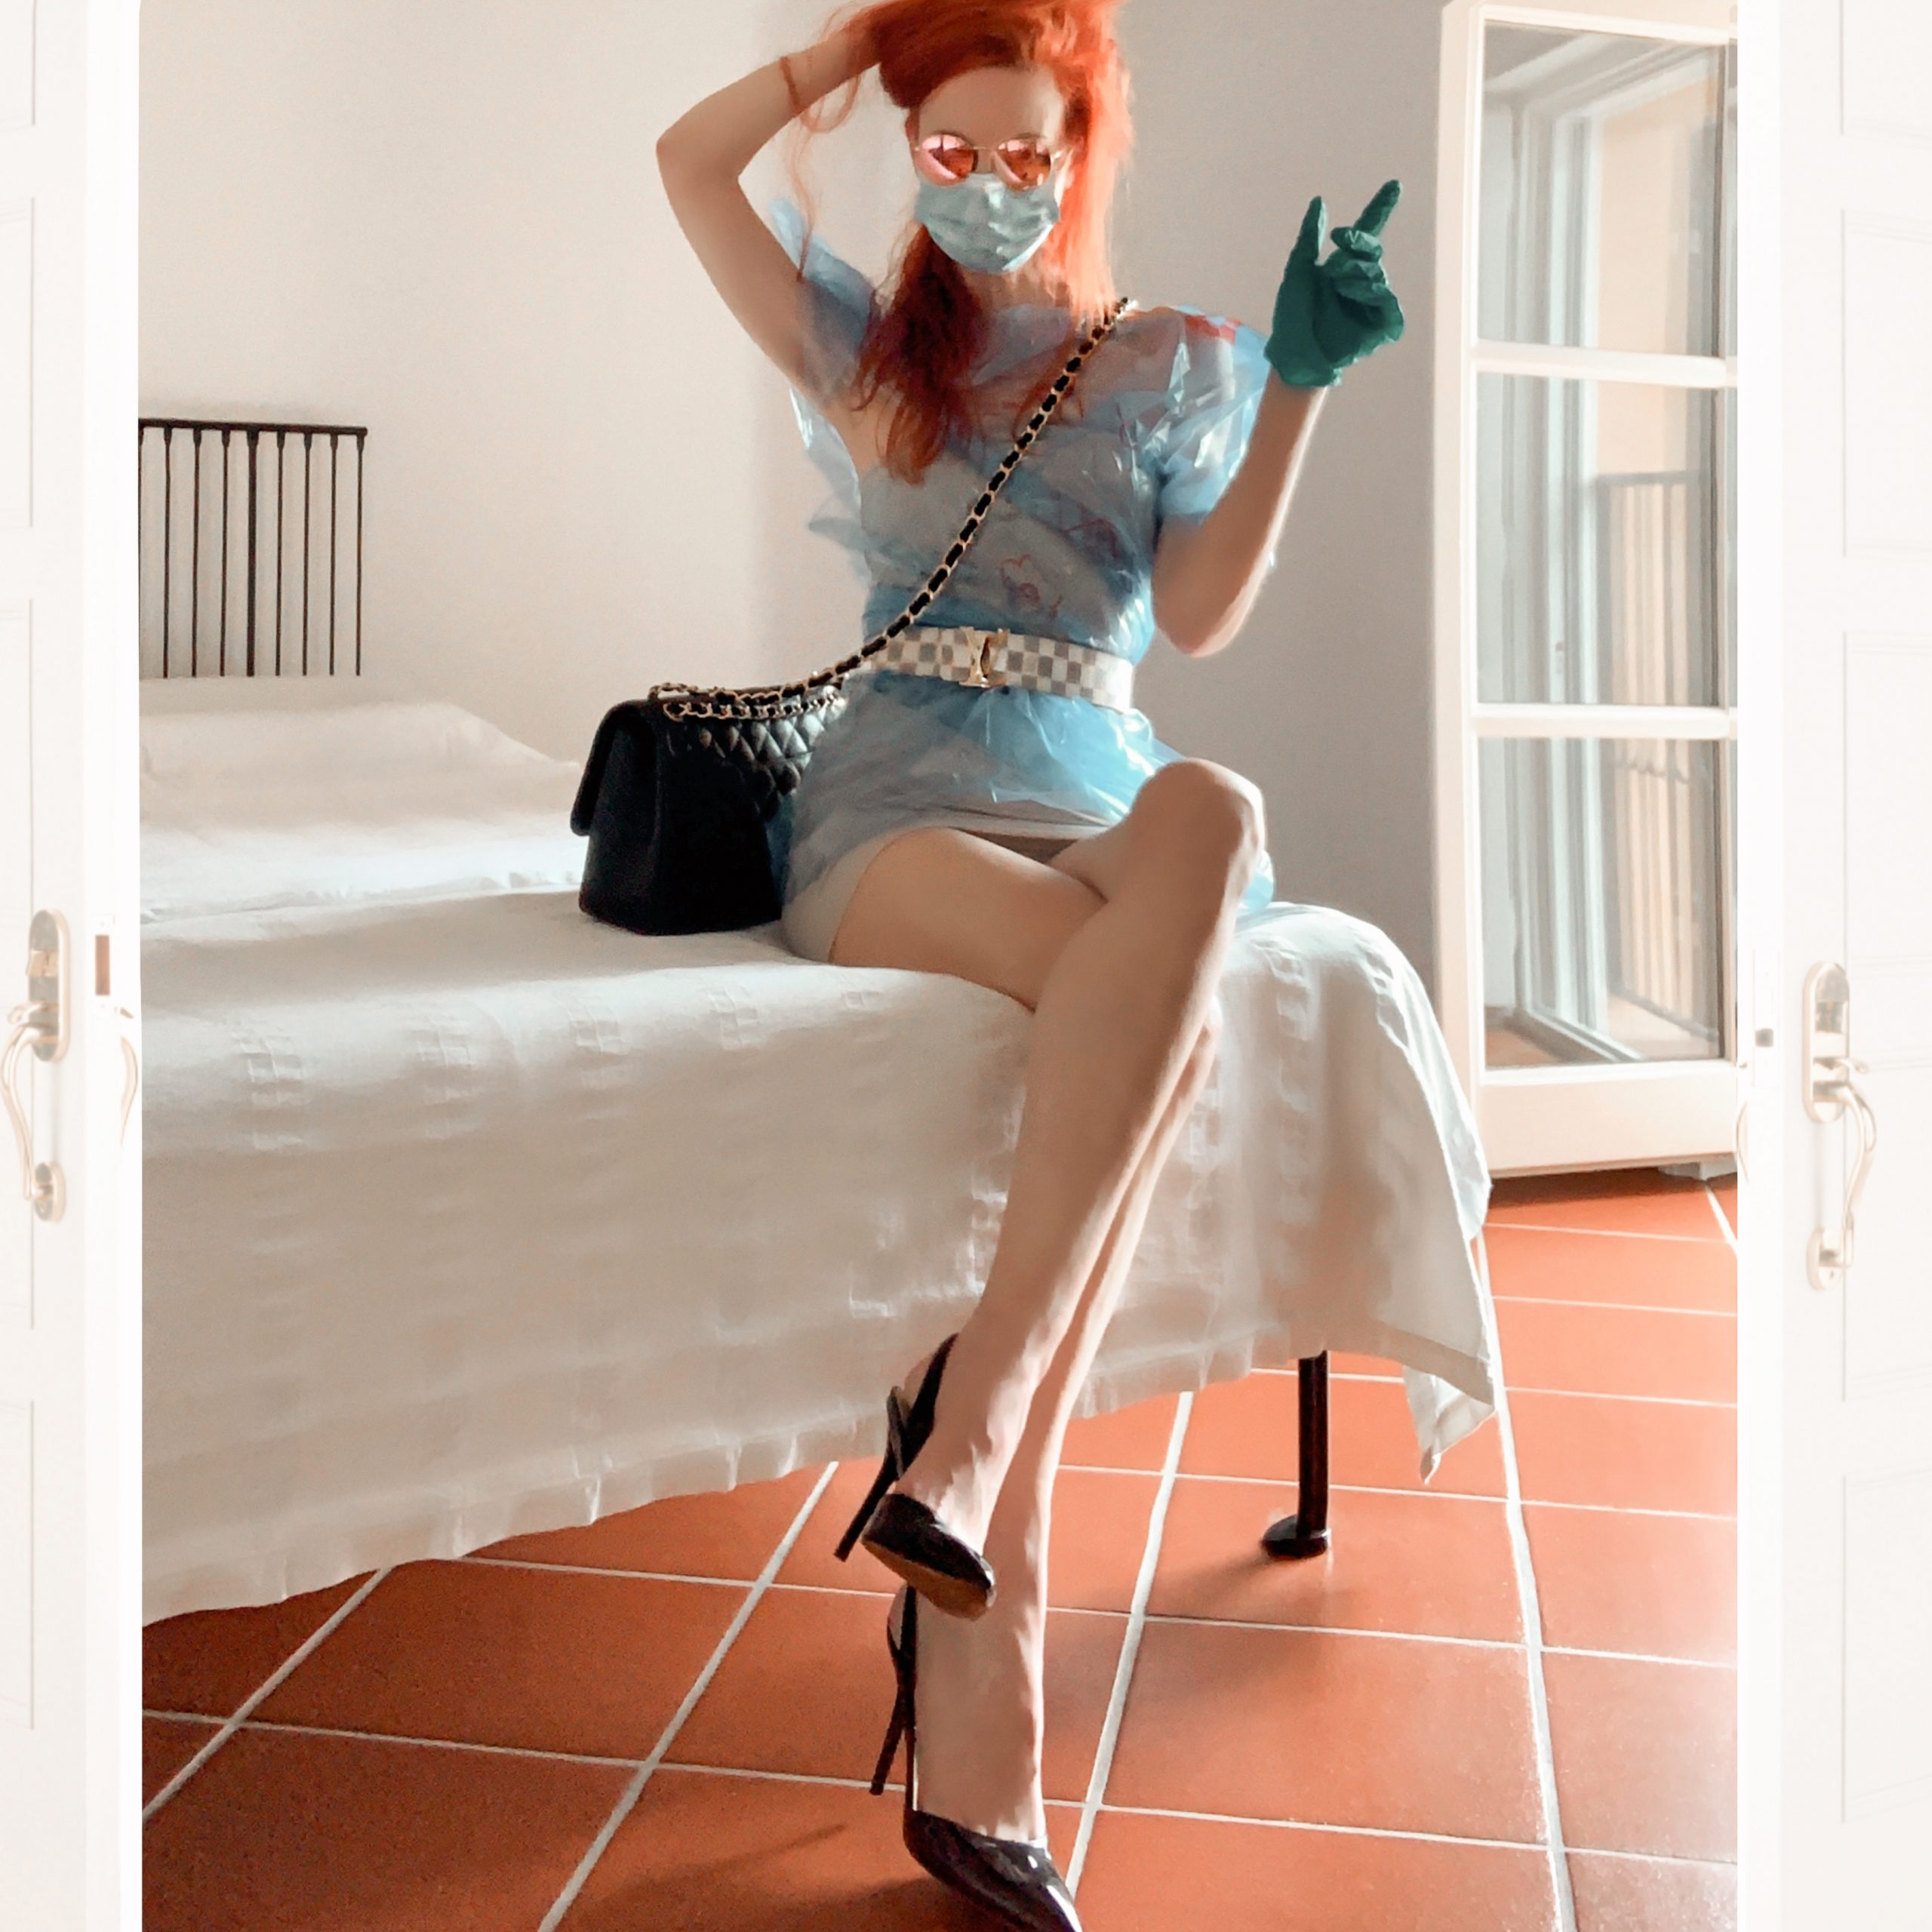 Categorie: Fashion, Glamour; Ph, Stylisth, Mua & Model: BARBARA BERTAGNI (Ladybb); Location: Cremona, CR, Italia